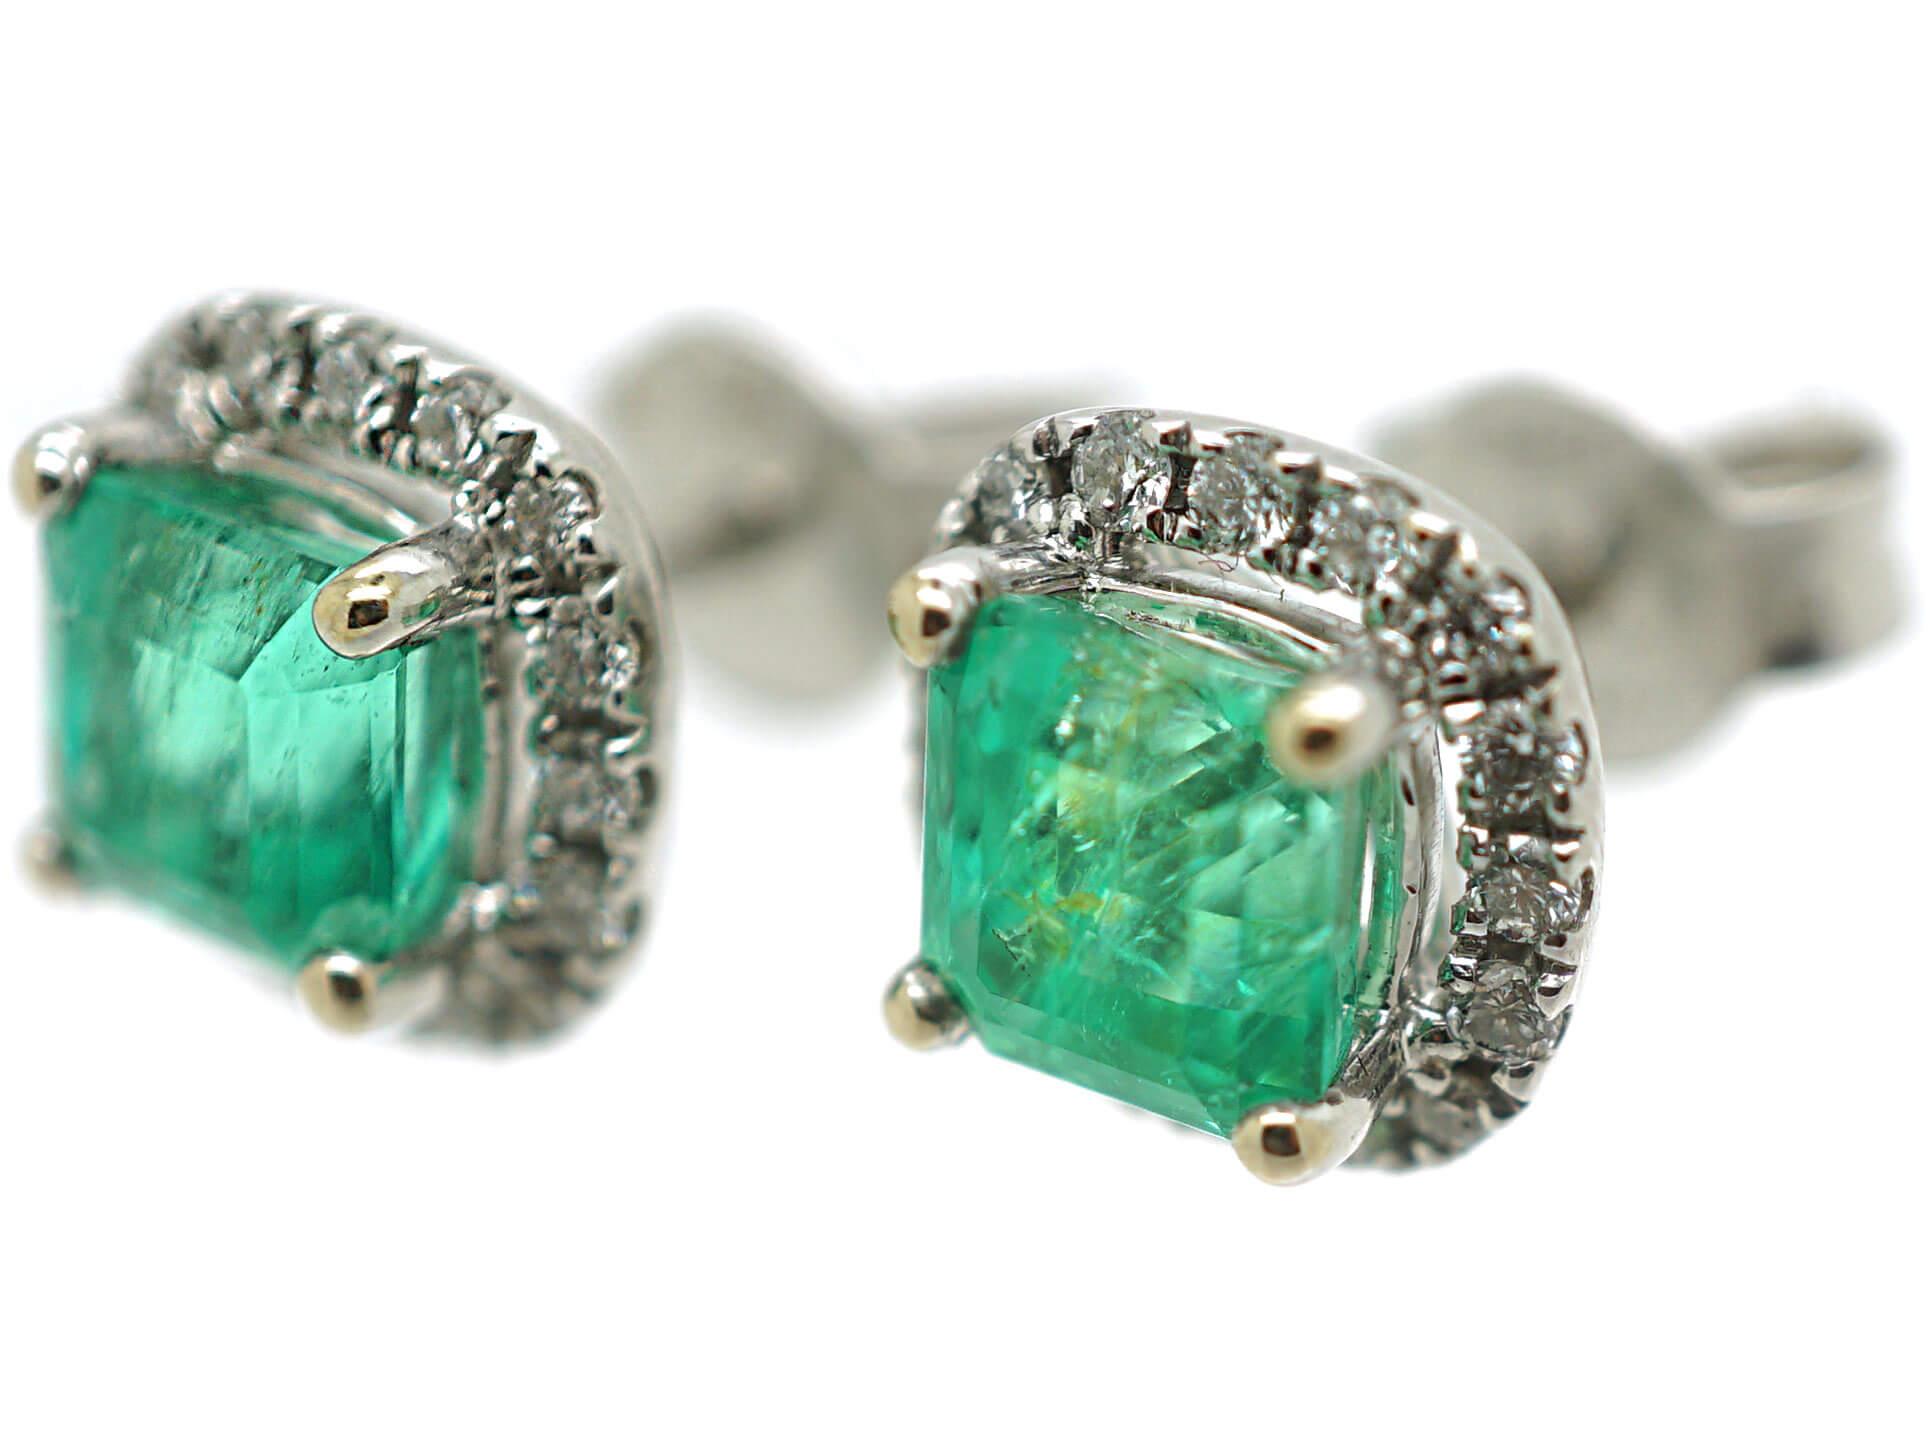 18ct White Gold Emerald & Diamond Earrings